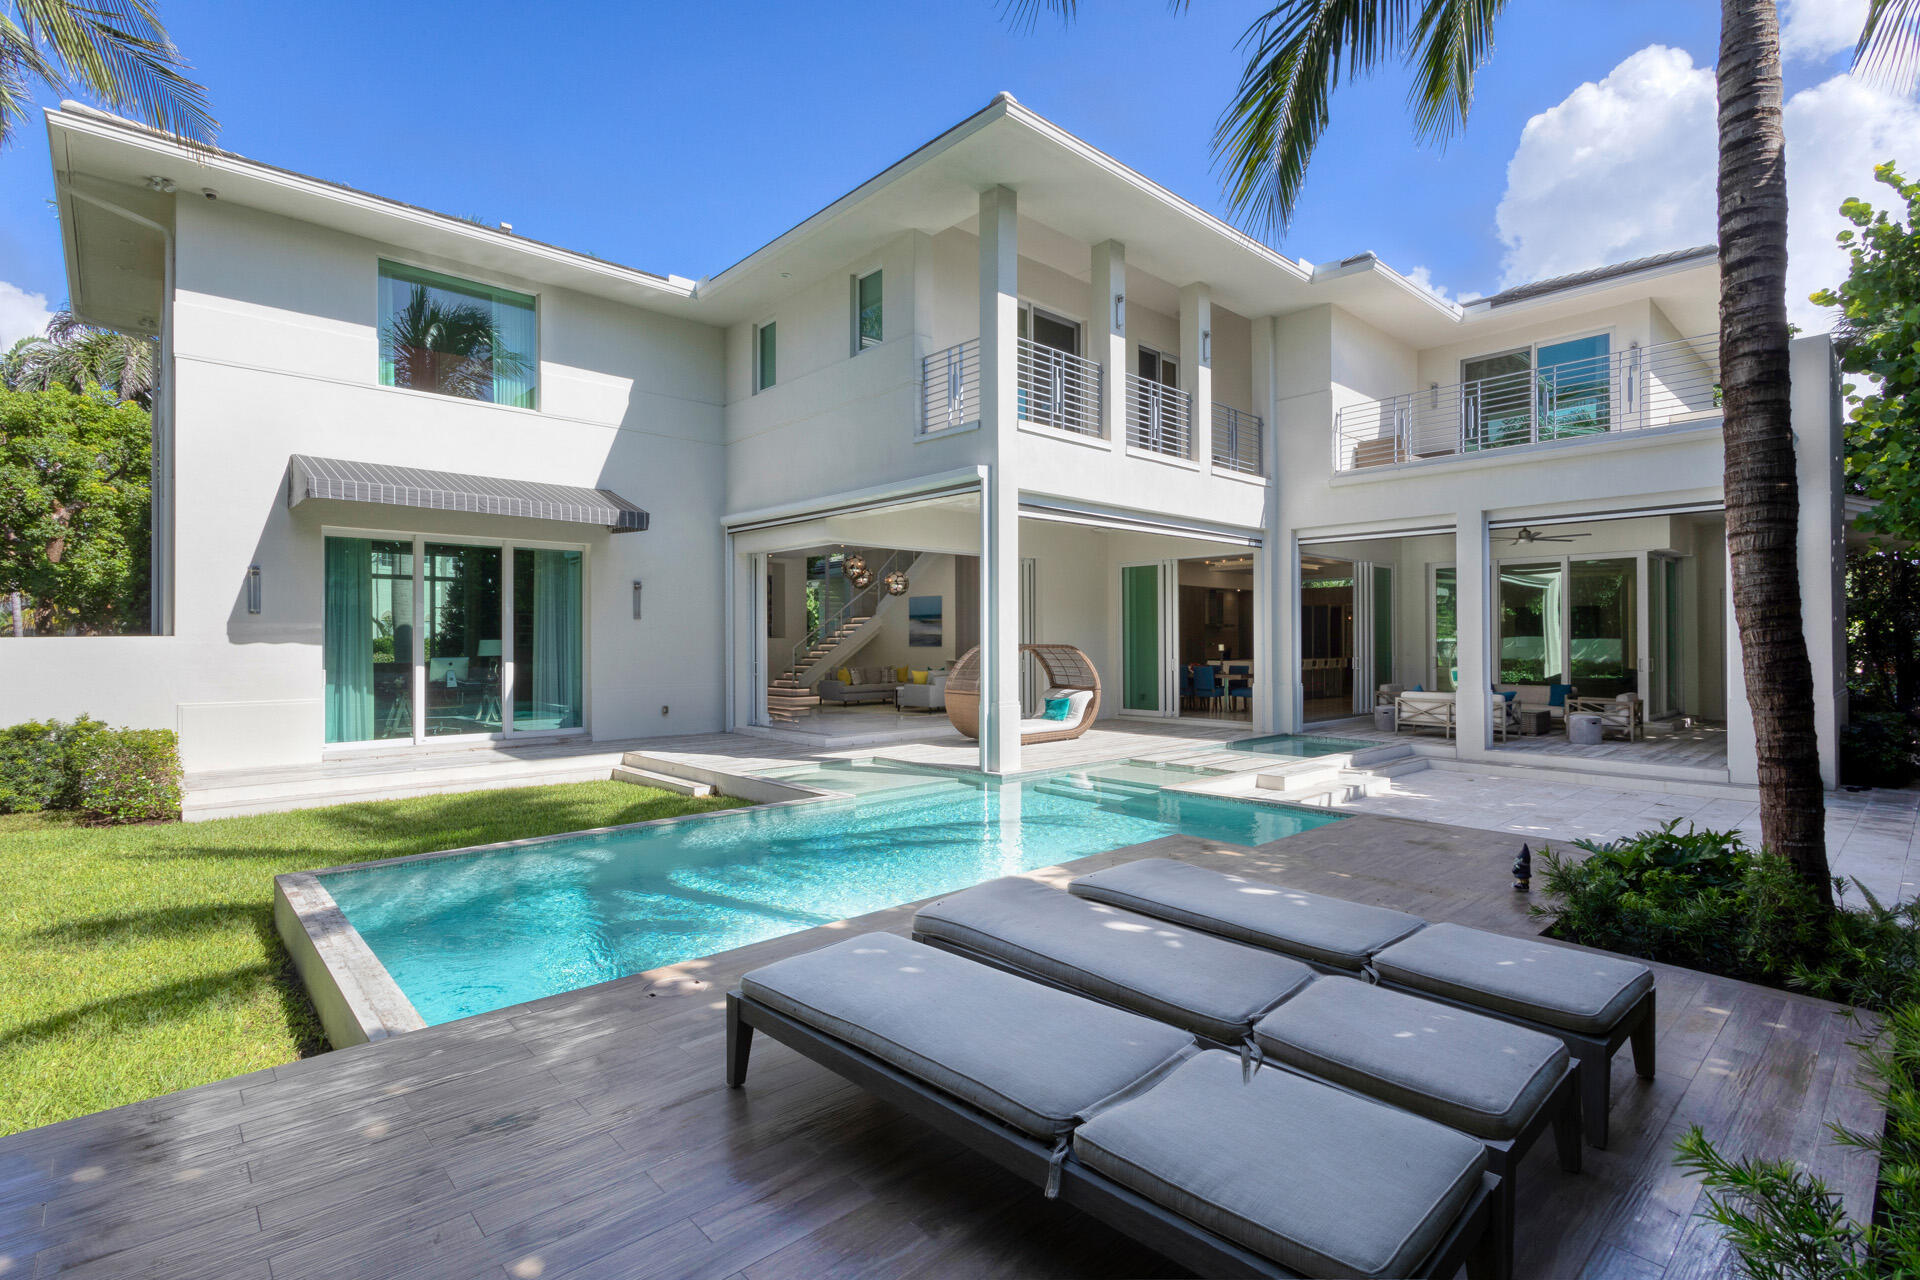 609 Seagate Drive, Delray Beach, Florida 33483, 5 Bedrooms Bedrooms, ,5.1 BathroomsBathrooms,Single Family Detached,For Sale,Seagate,RX-10751360